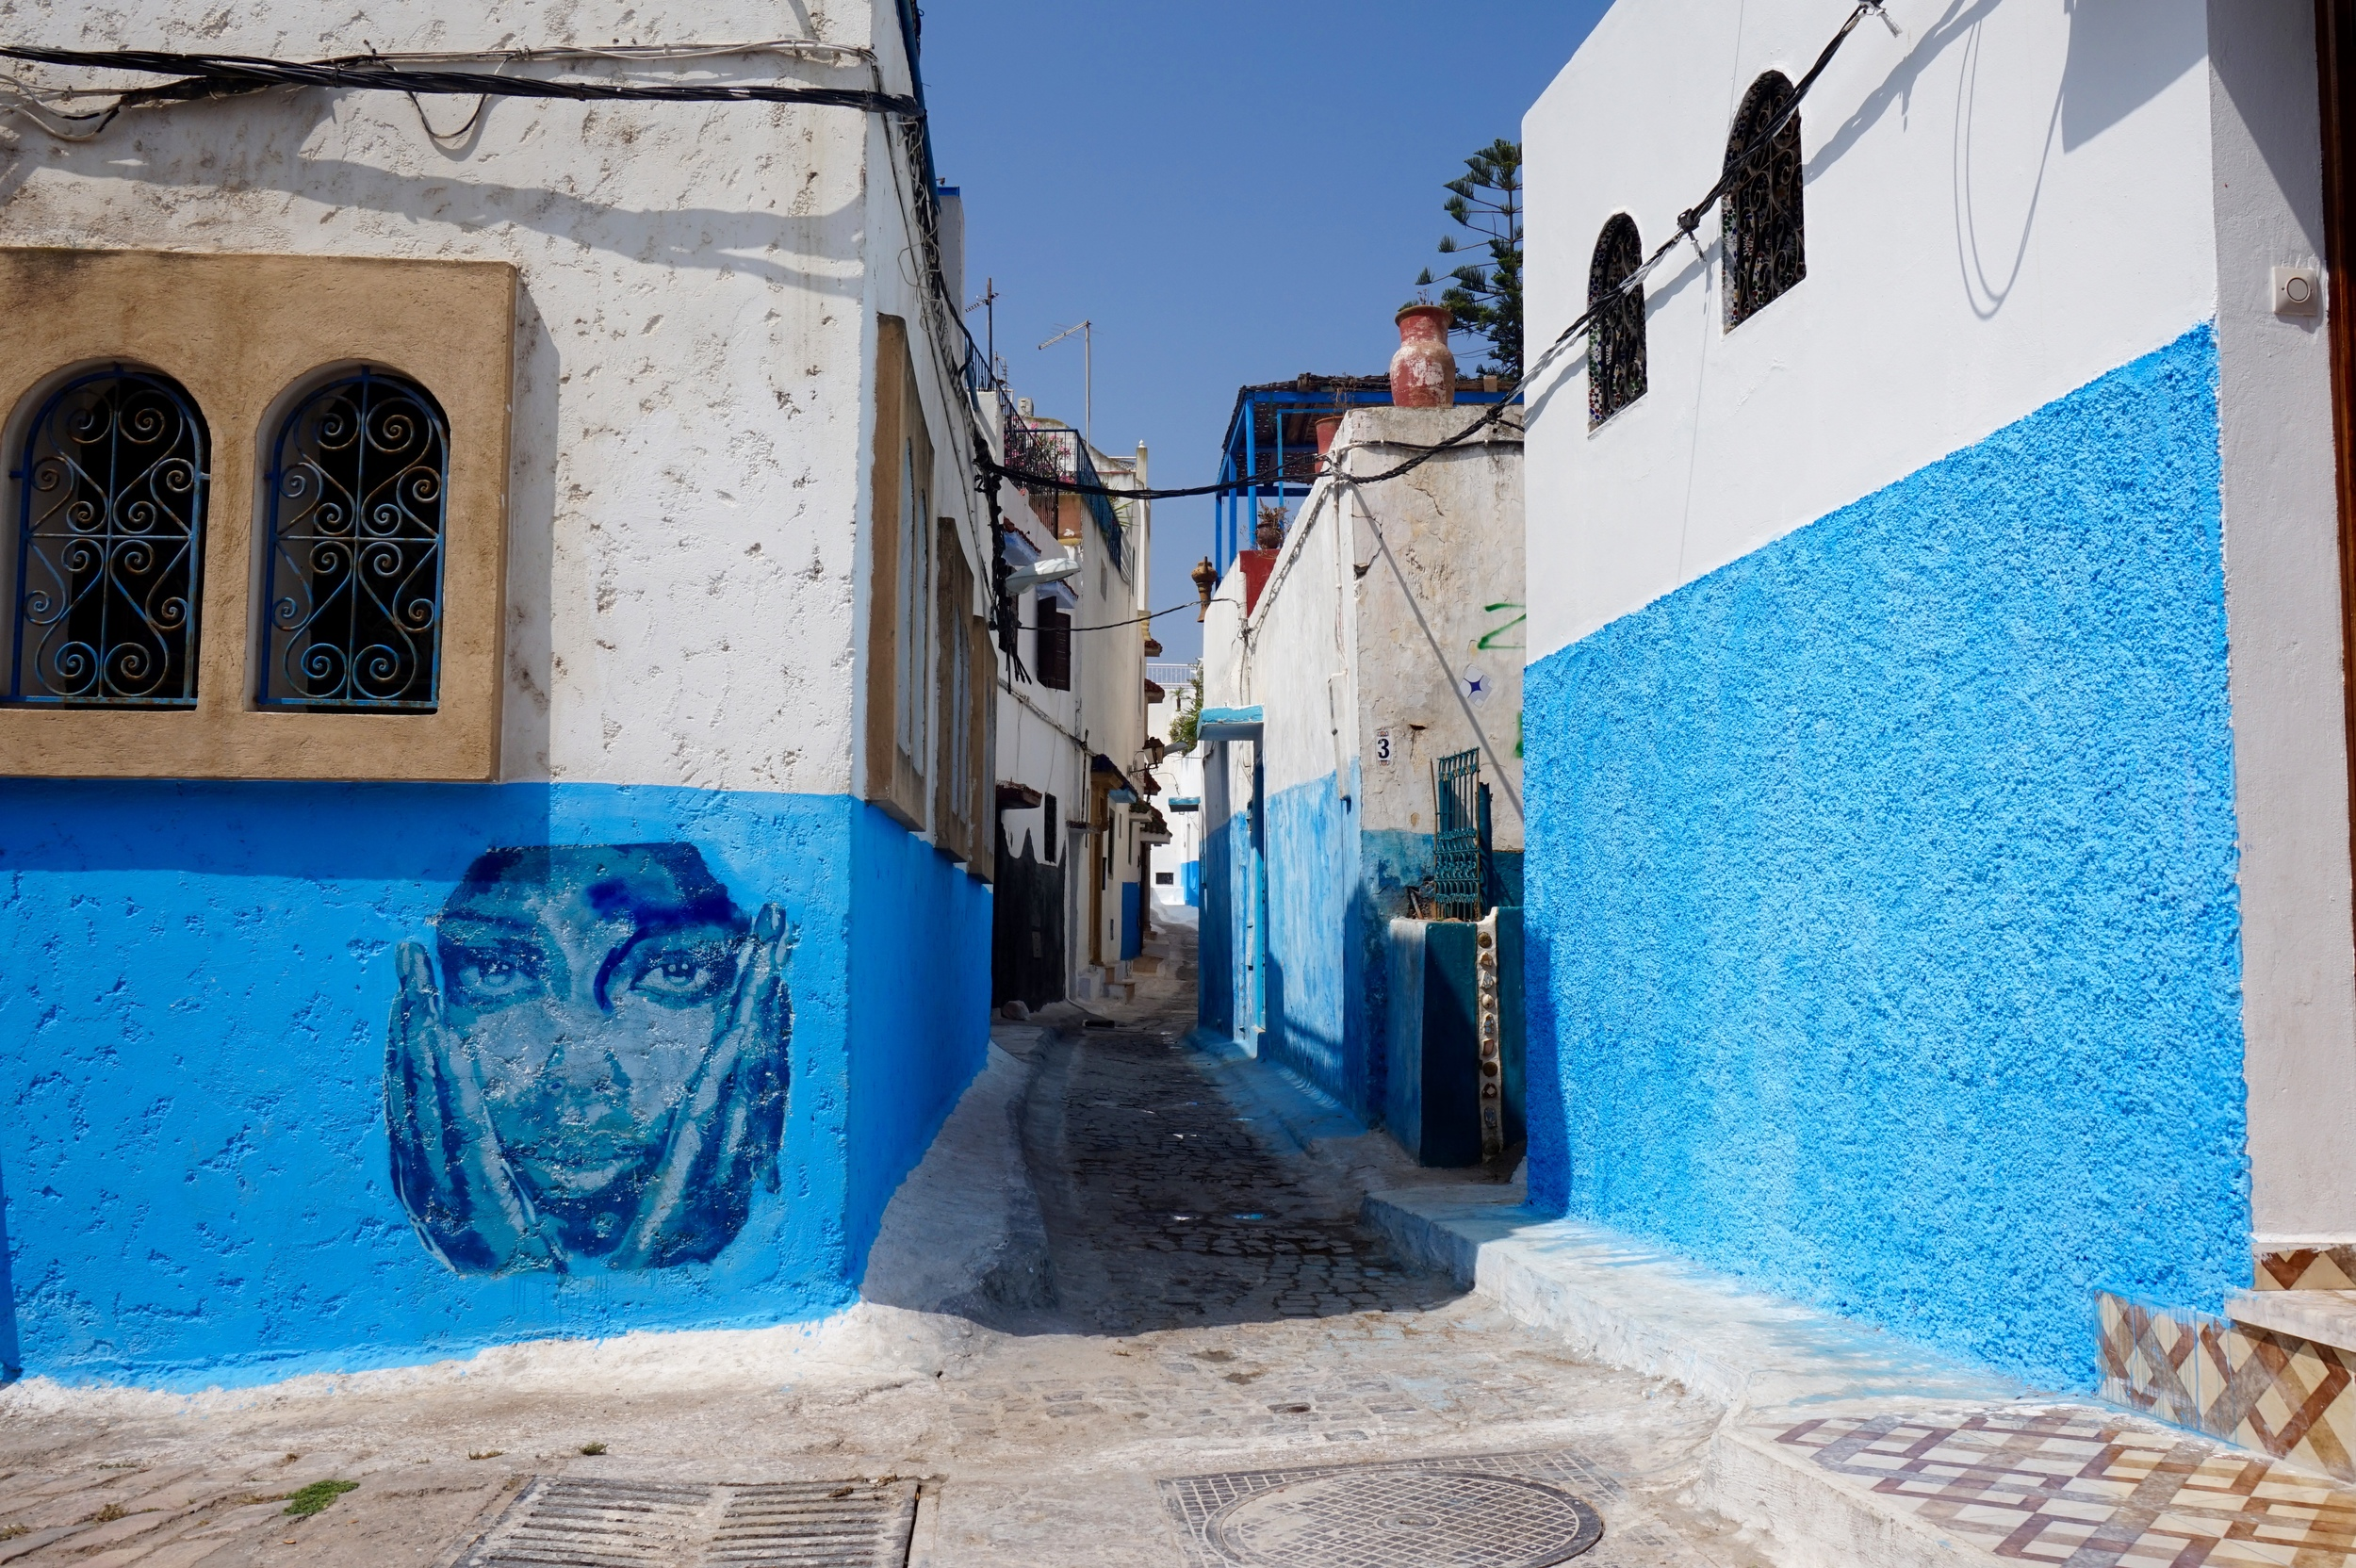 moroccostreetart.jpg